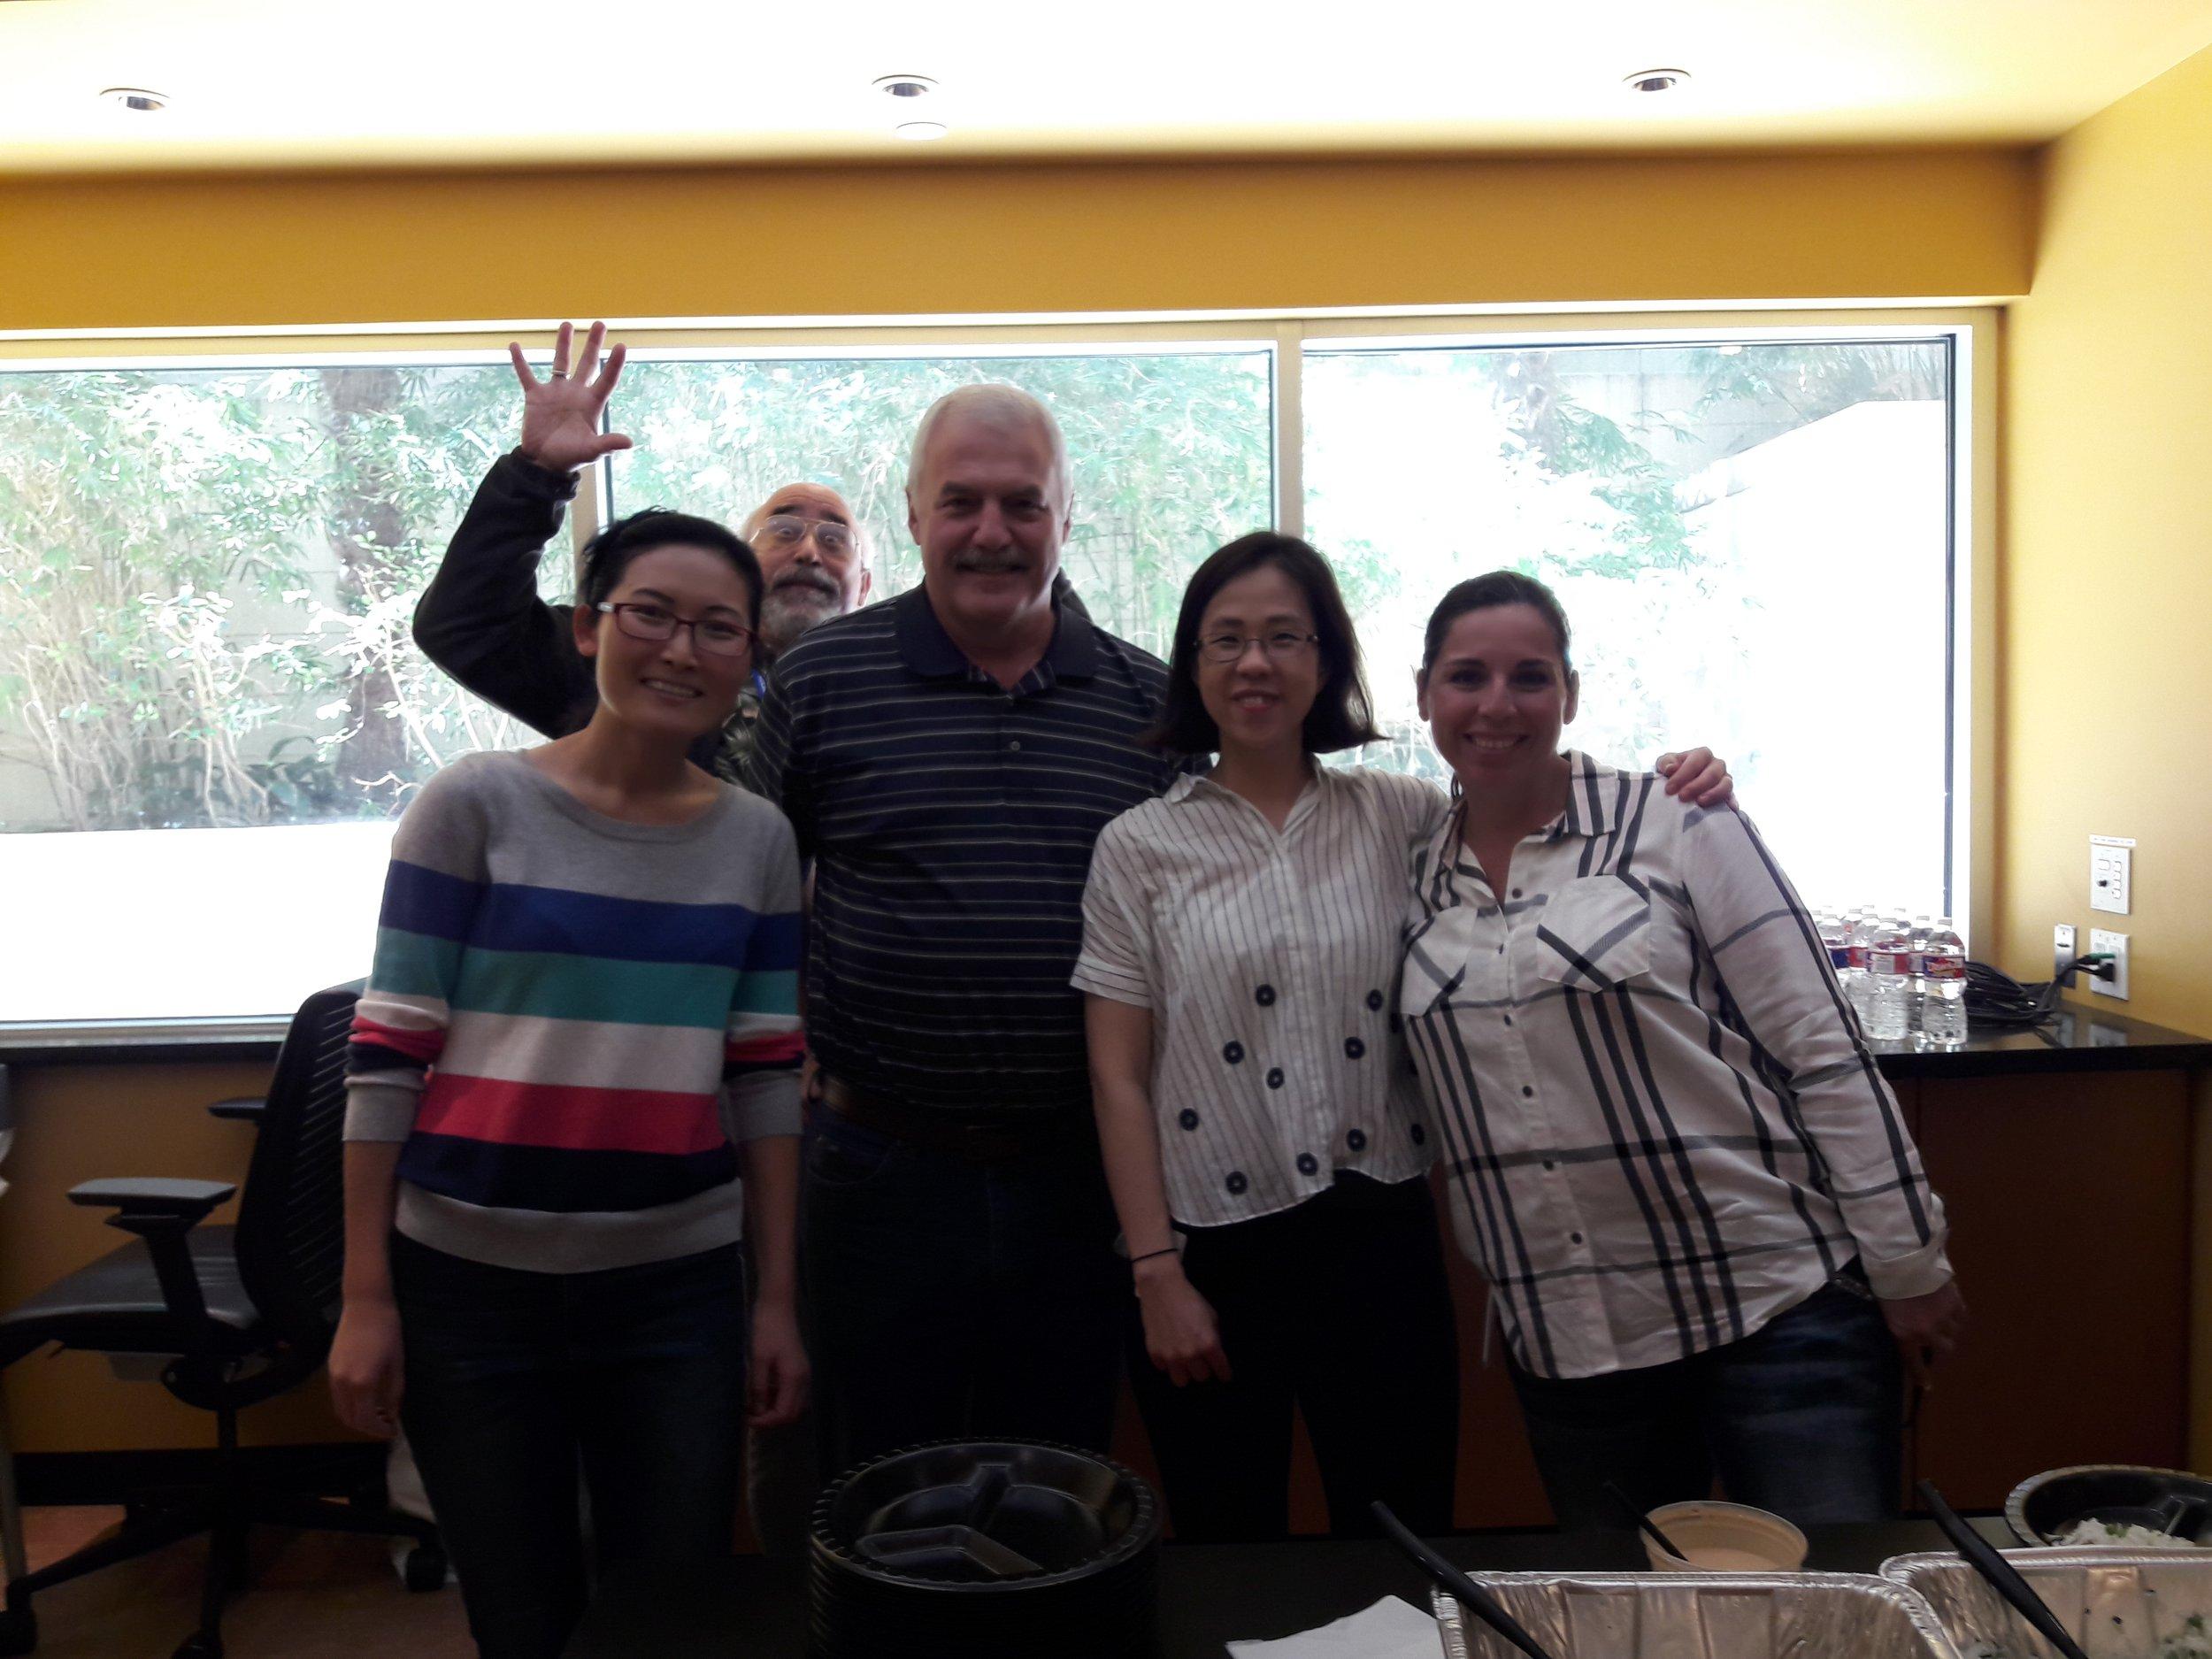 Yun Lab Appreciation Lunch in April 2018